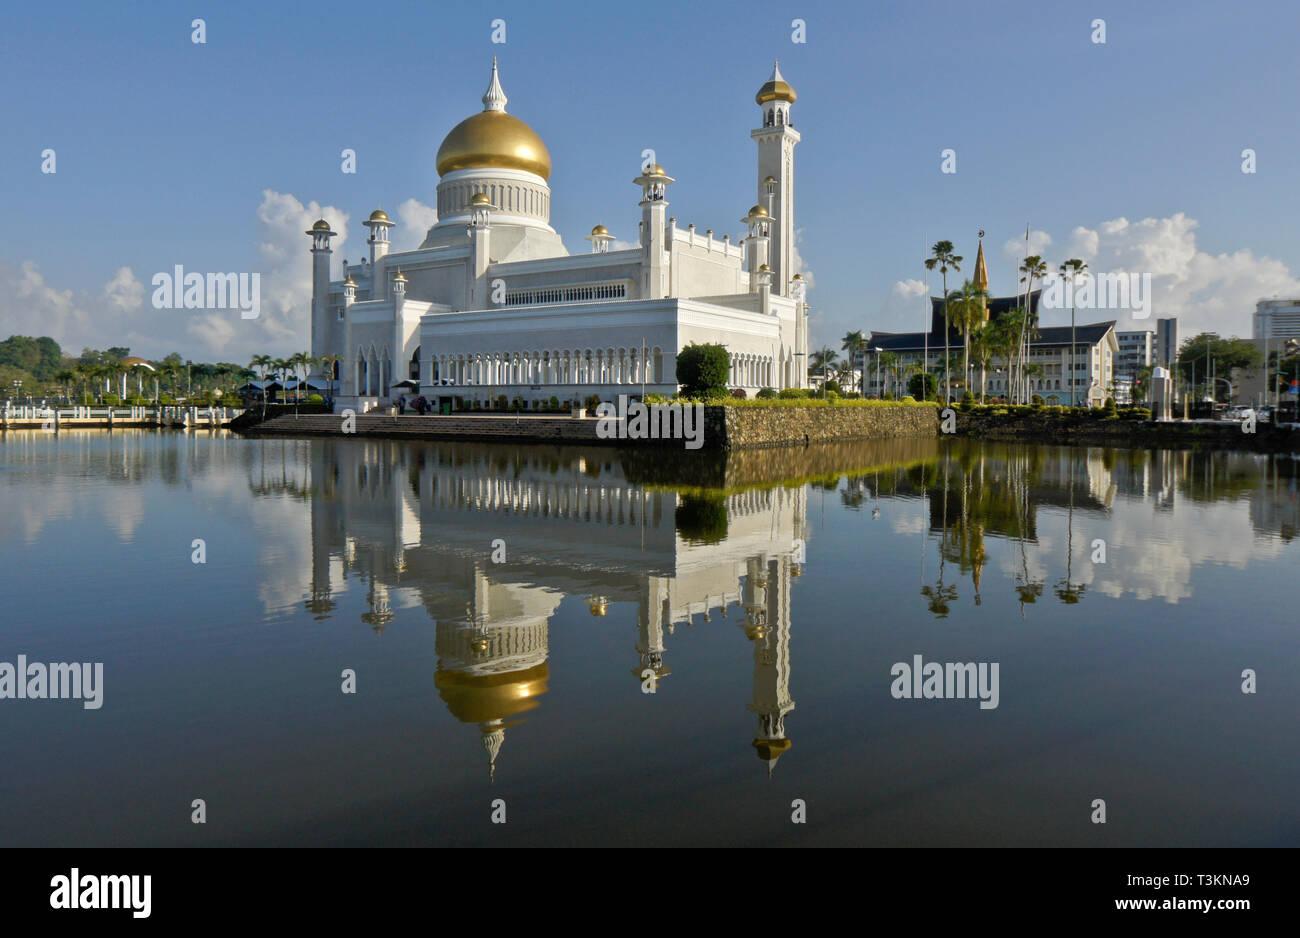 Sultan Oman Ali Saifuddien Mosque, Bandar Seri Begawan, Sultanate of Brunei - Stock Image